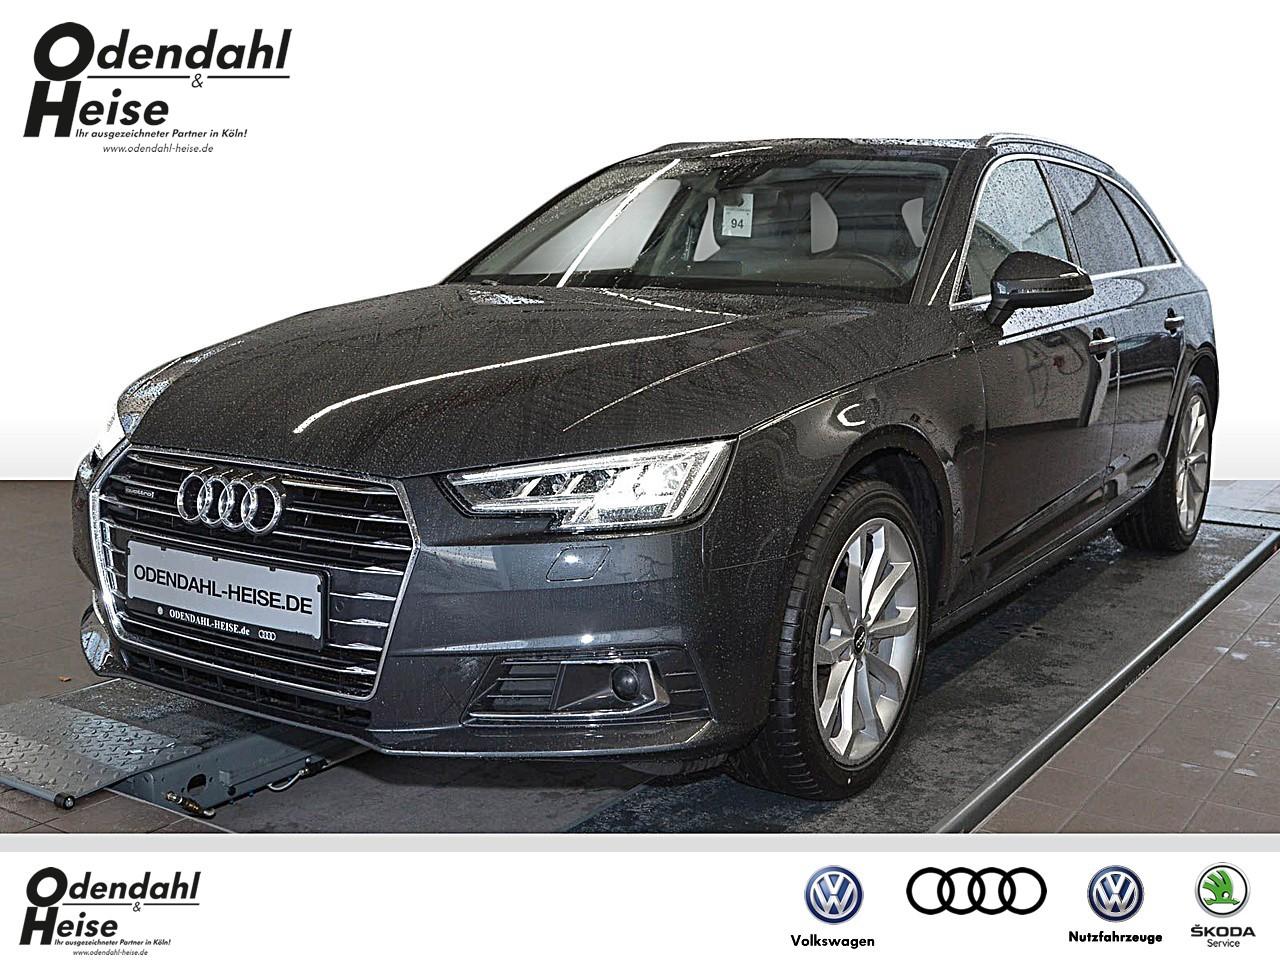 Audi A4 Avant design 2.0 TDI quattro S tronic Klima, Jahr 2017, Diesel